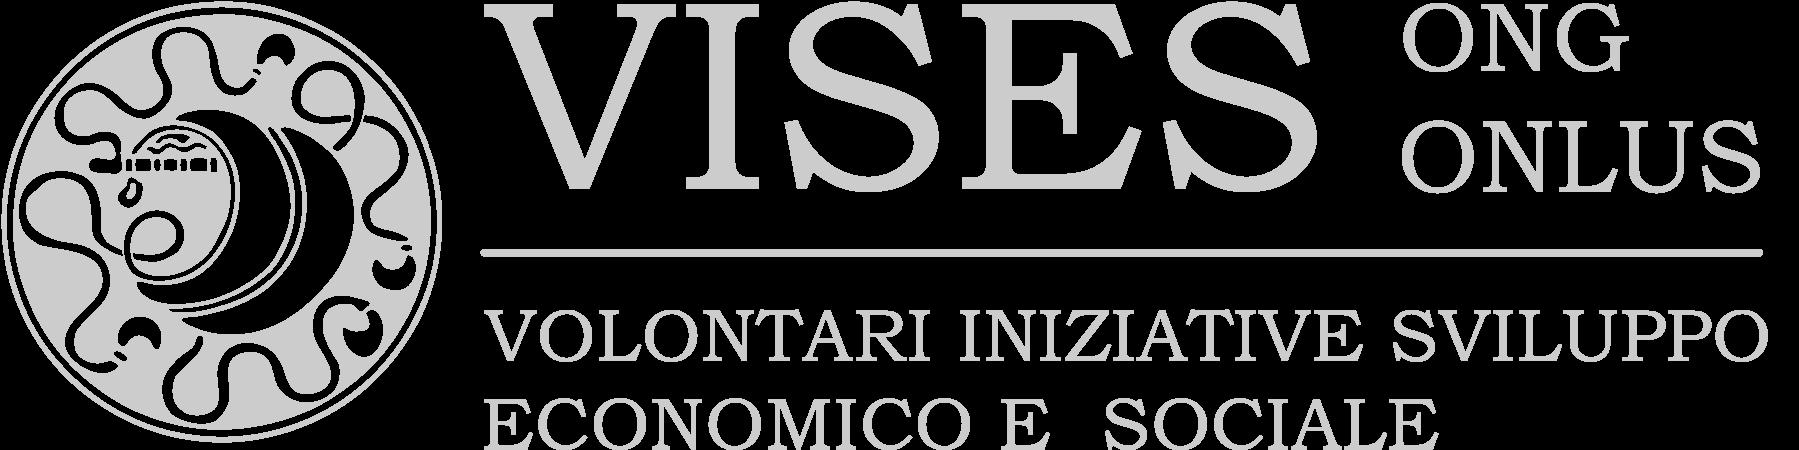 logo_vises